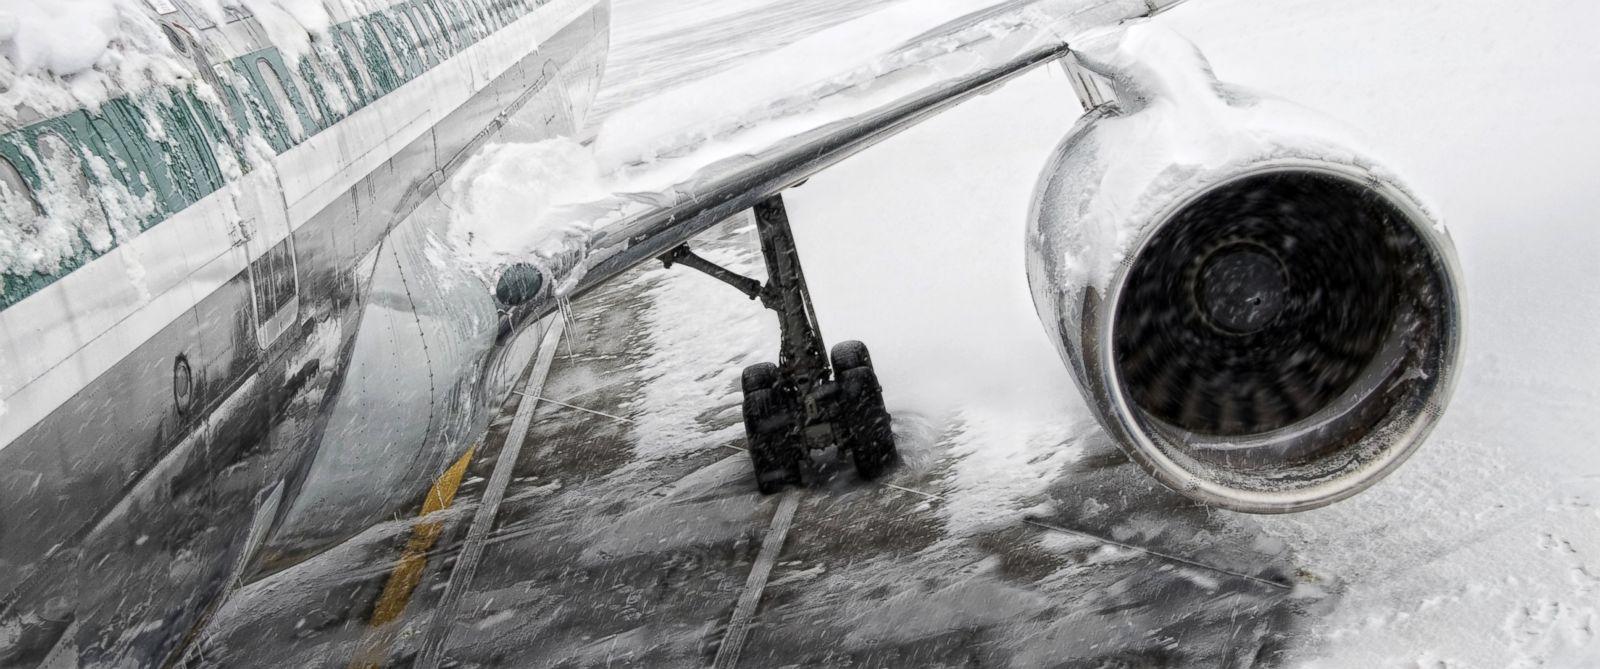 GTY_plane_snow_jef_160122_12x5_1600_1486646742046.jpg